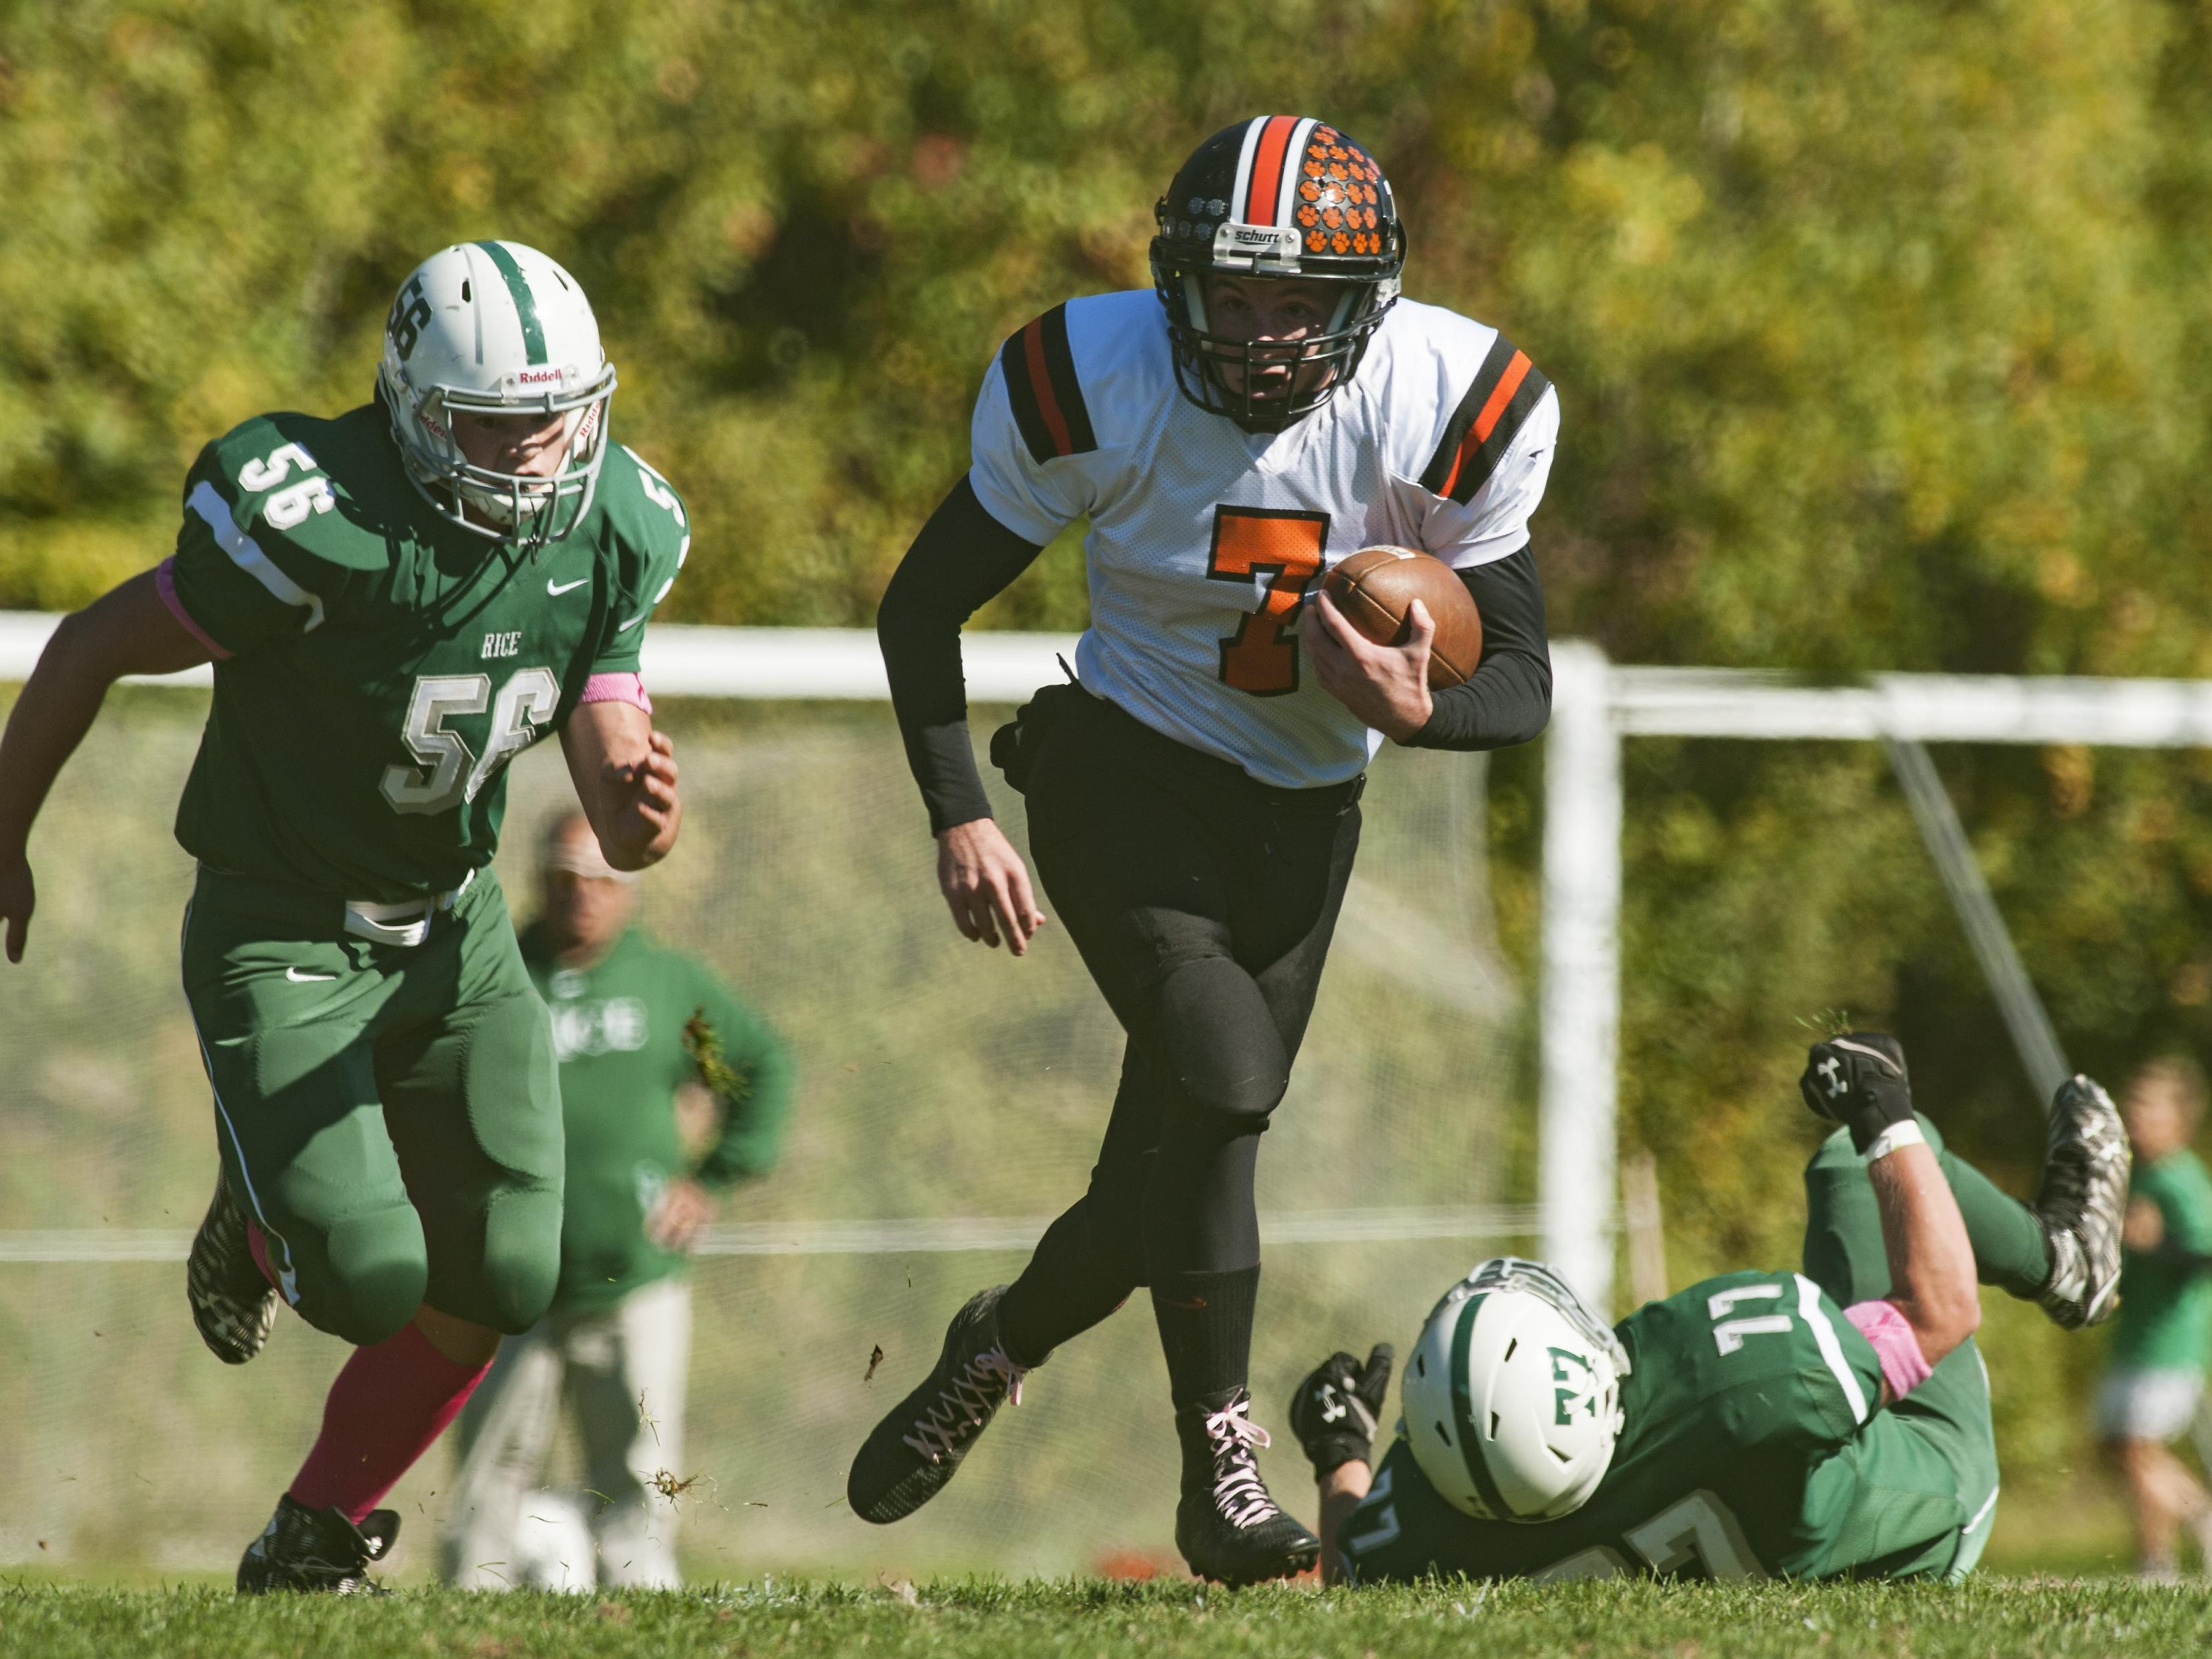 Middlebury quarterback Oakley Gordon (7) runs with the ball during a high school football game Saturday.